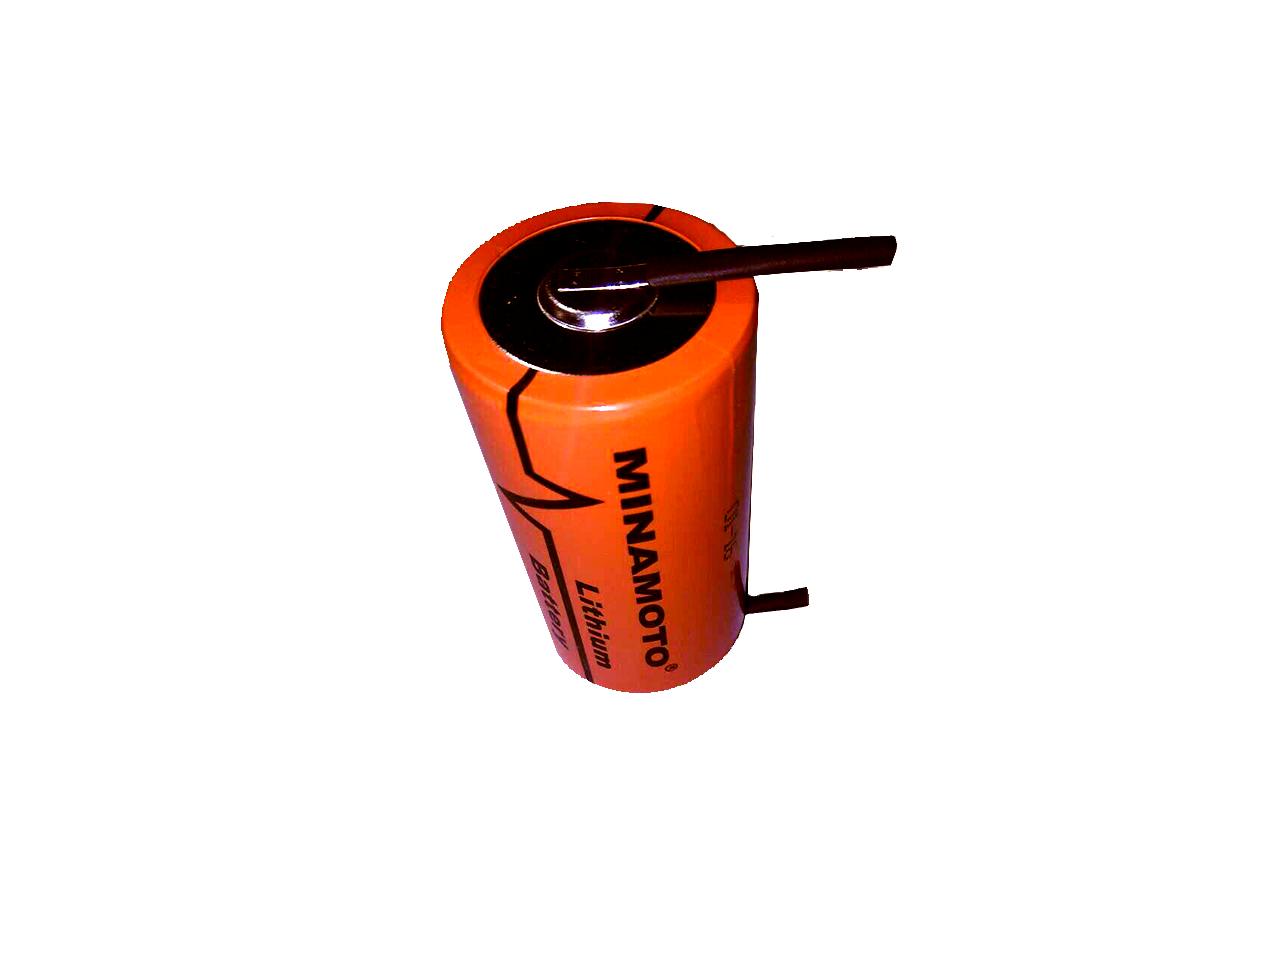 Батарейка литиевая размер D  Minamoto 3,6 вольт ER-34615 Н/Т